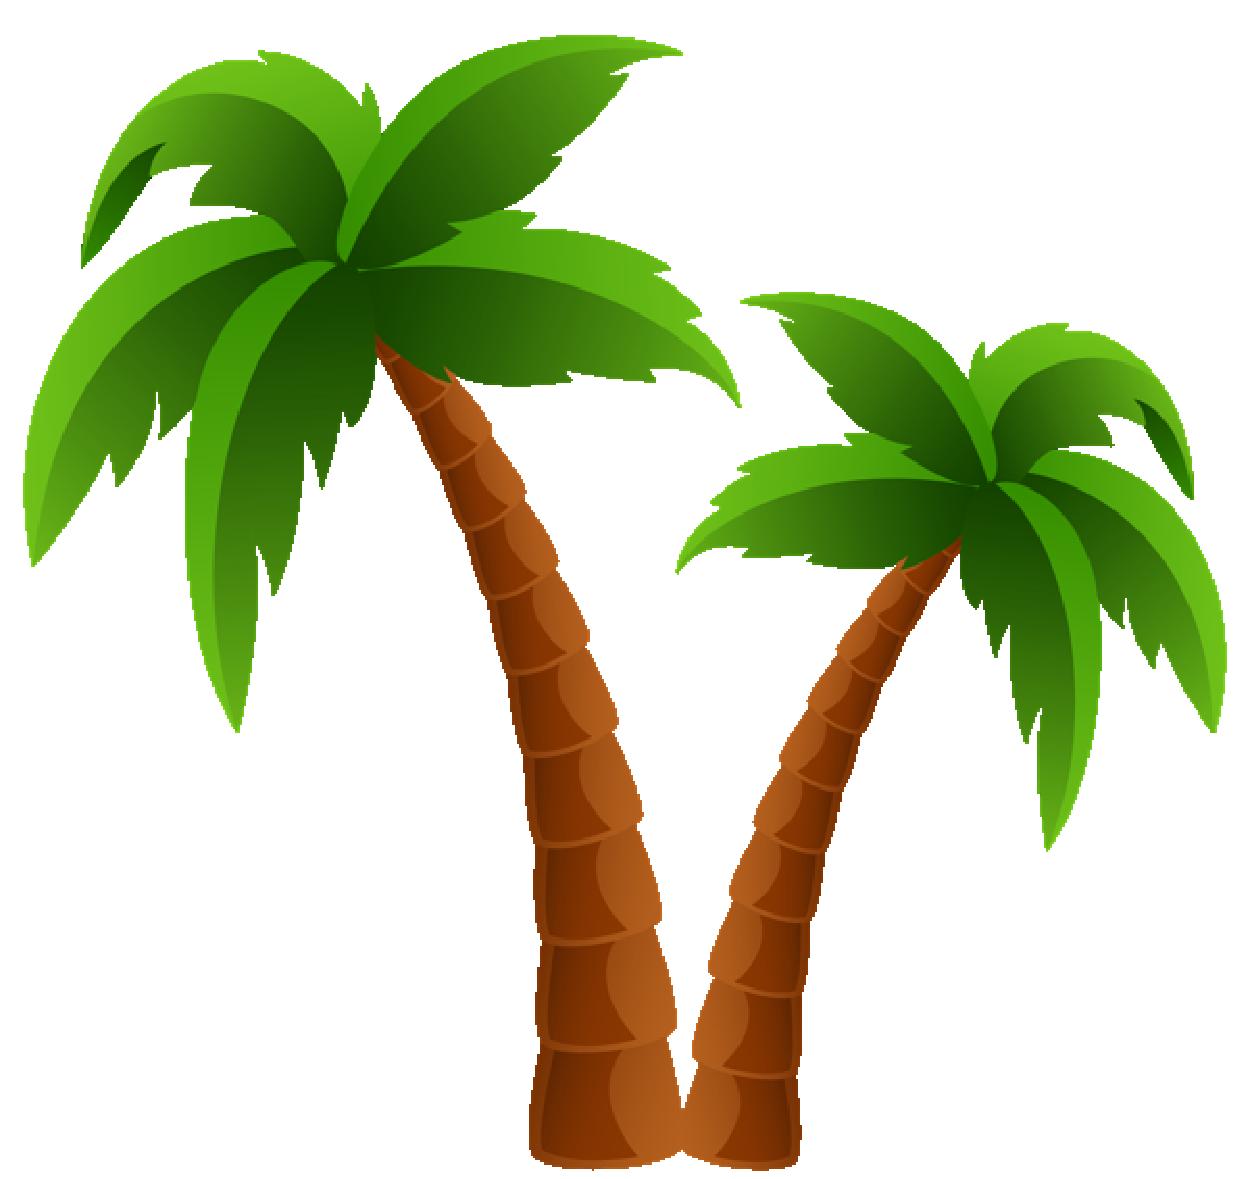 Jungle clipart palm tree, Jungle palm tree Transparent ...